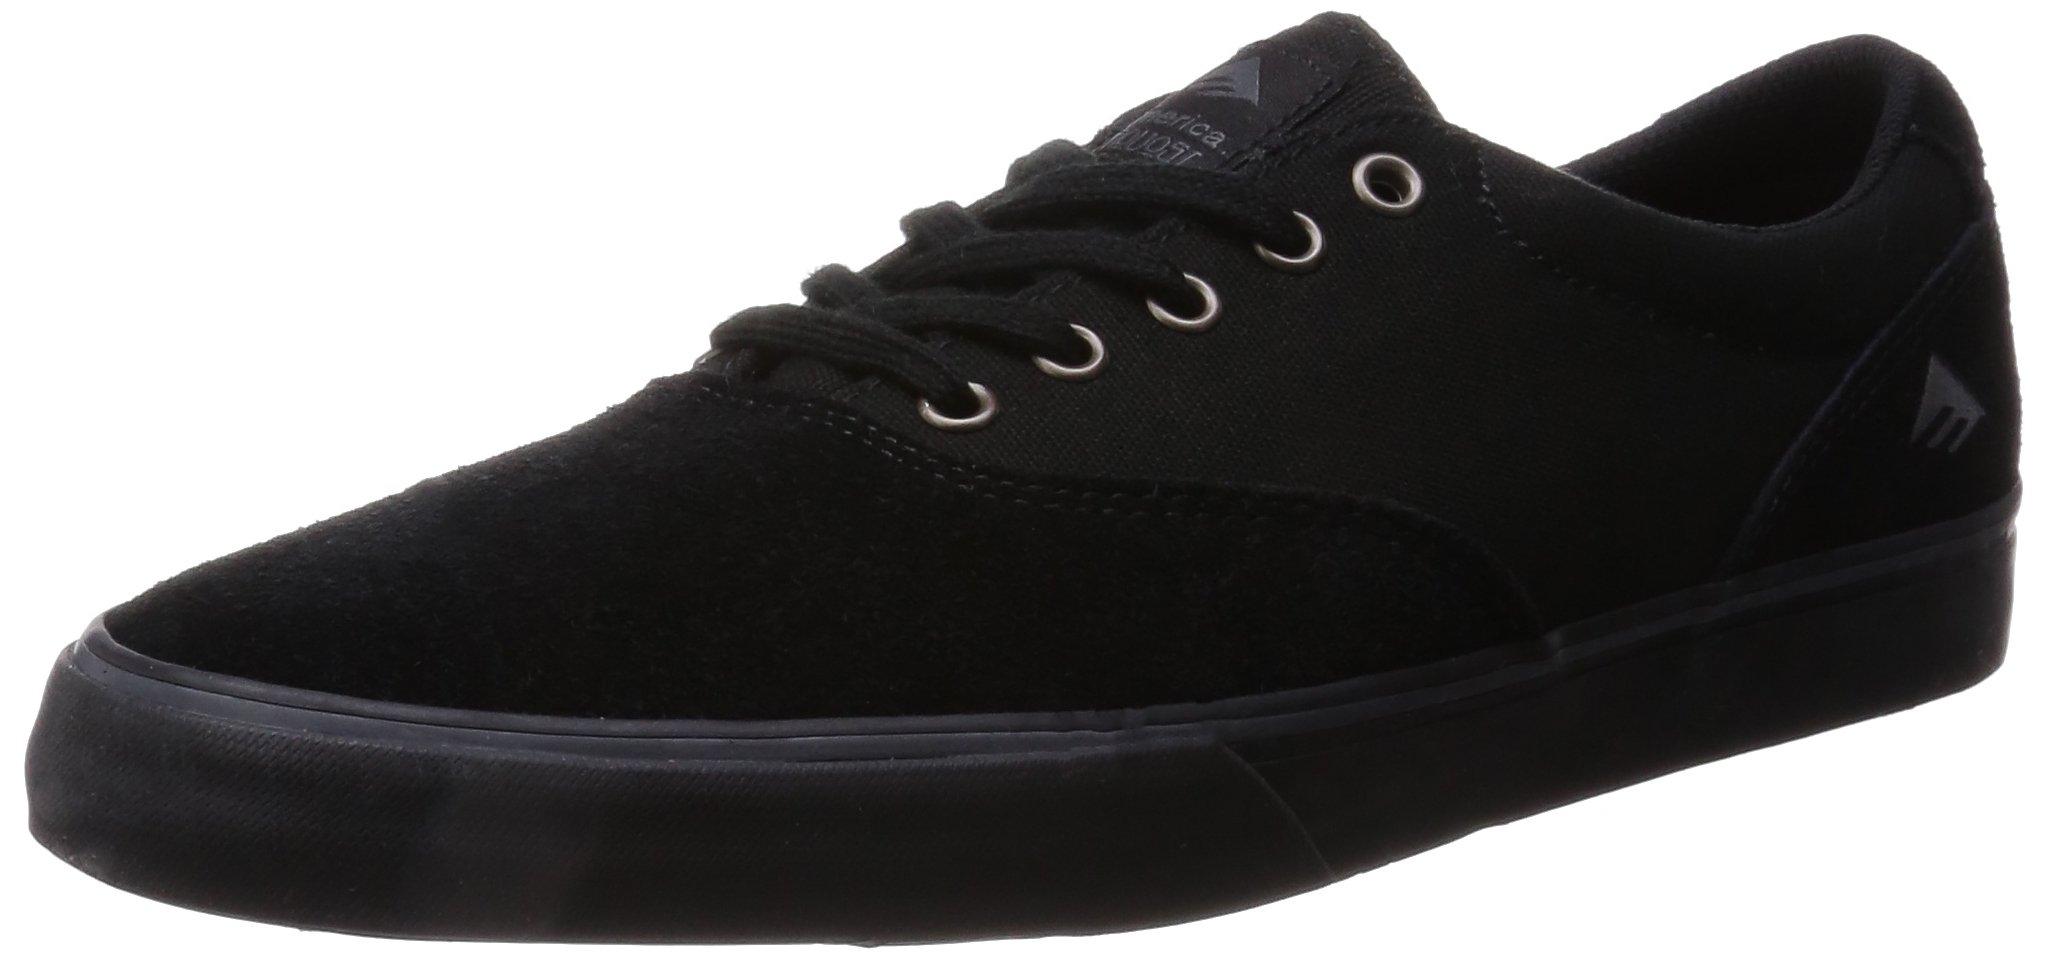 Emerica Provost Slim Vulc Skate Shoe,Black/Black,7